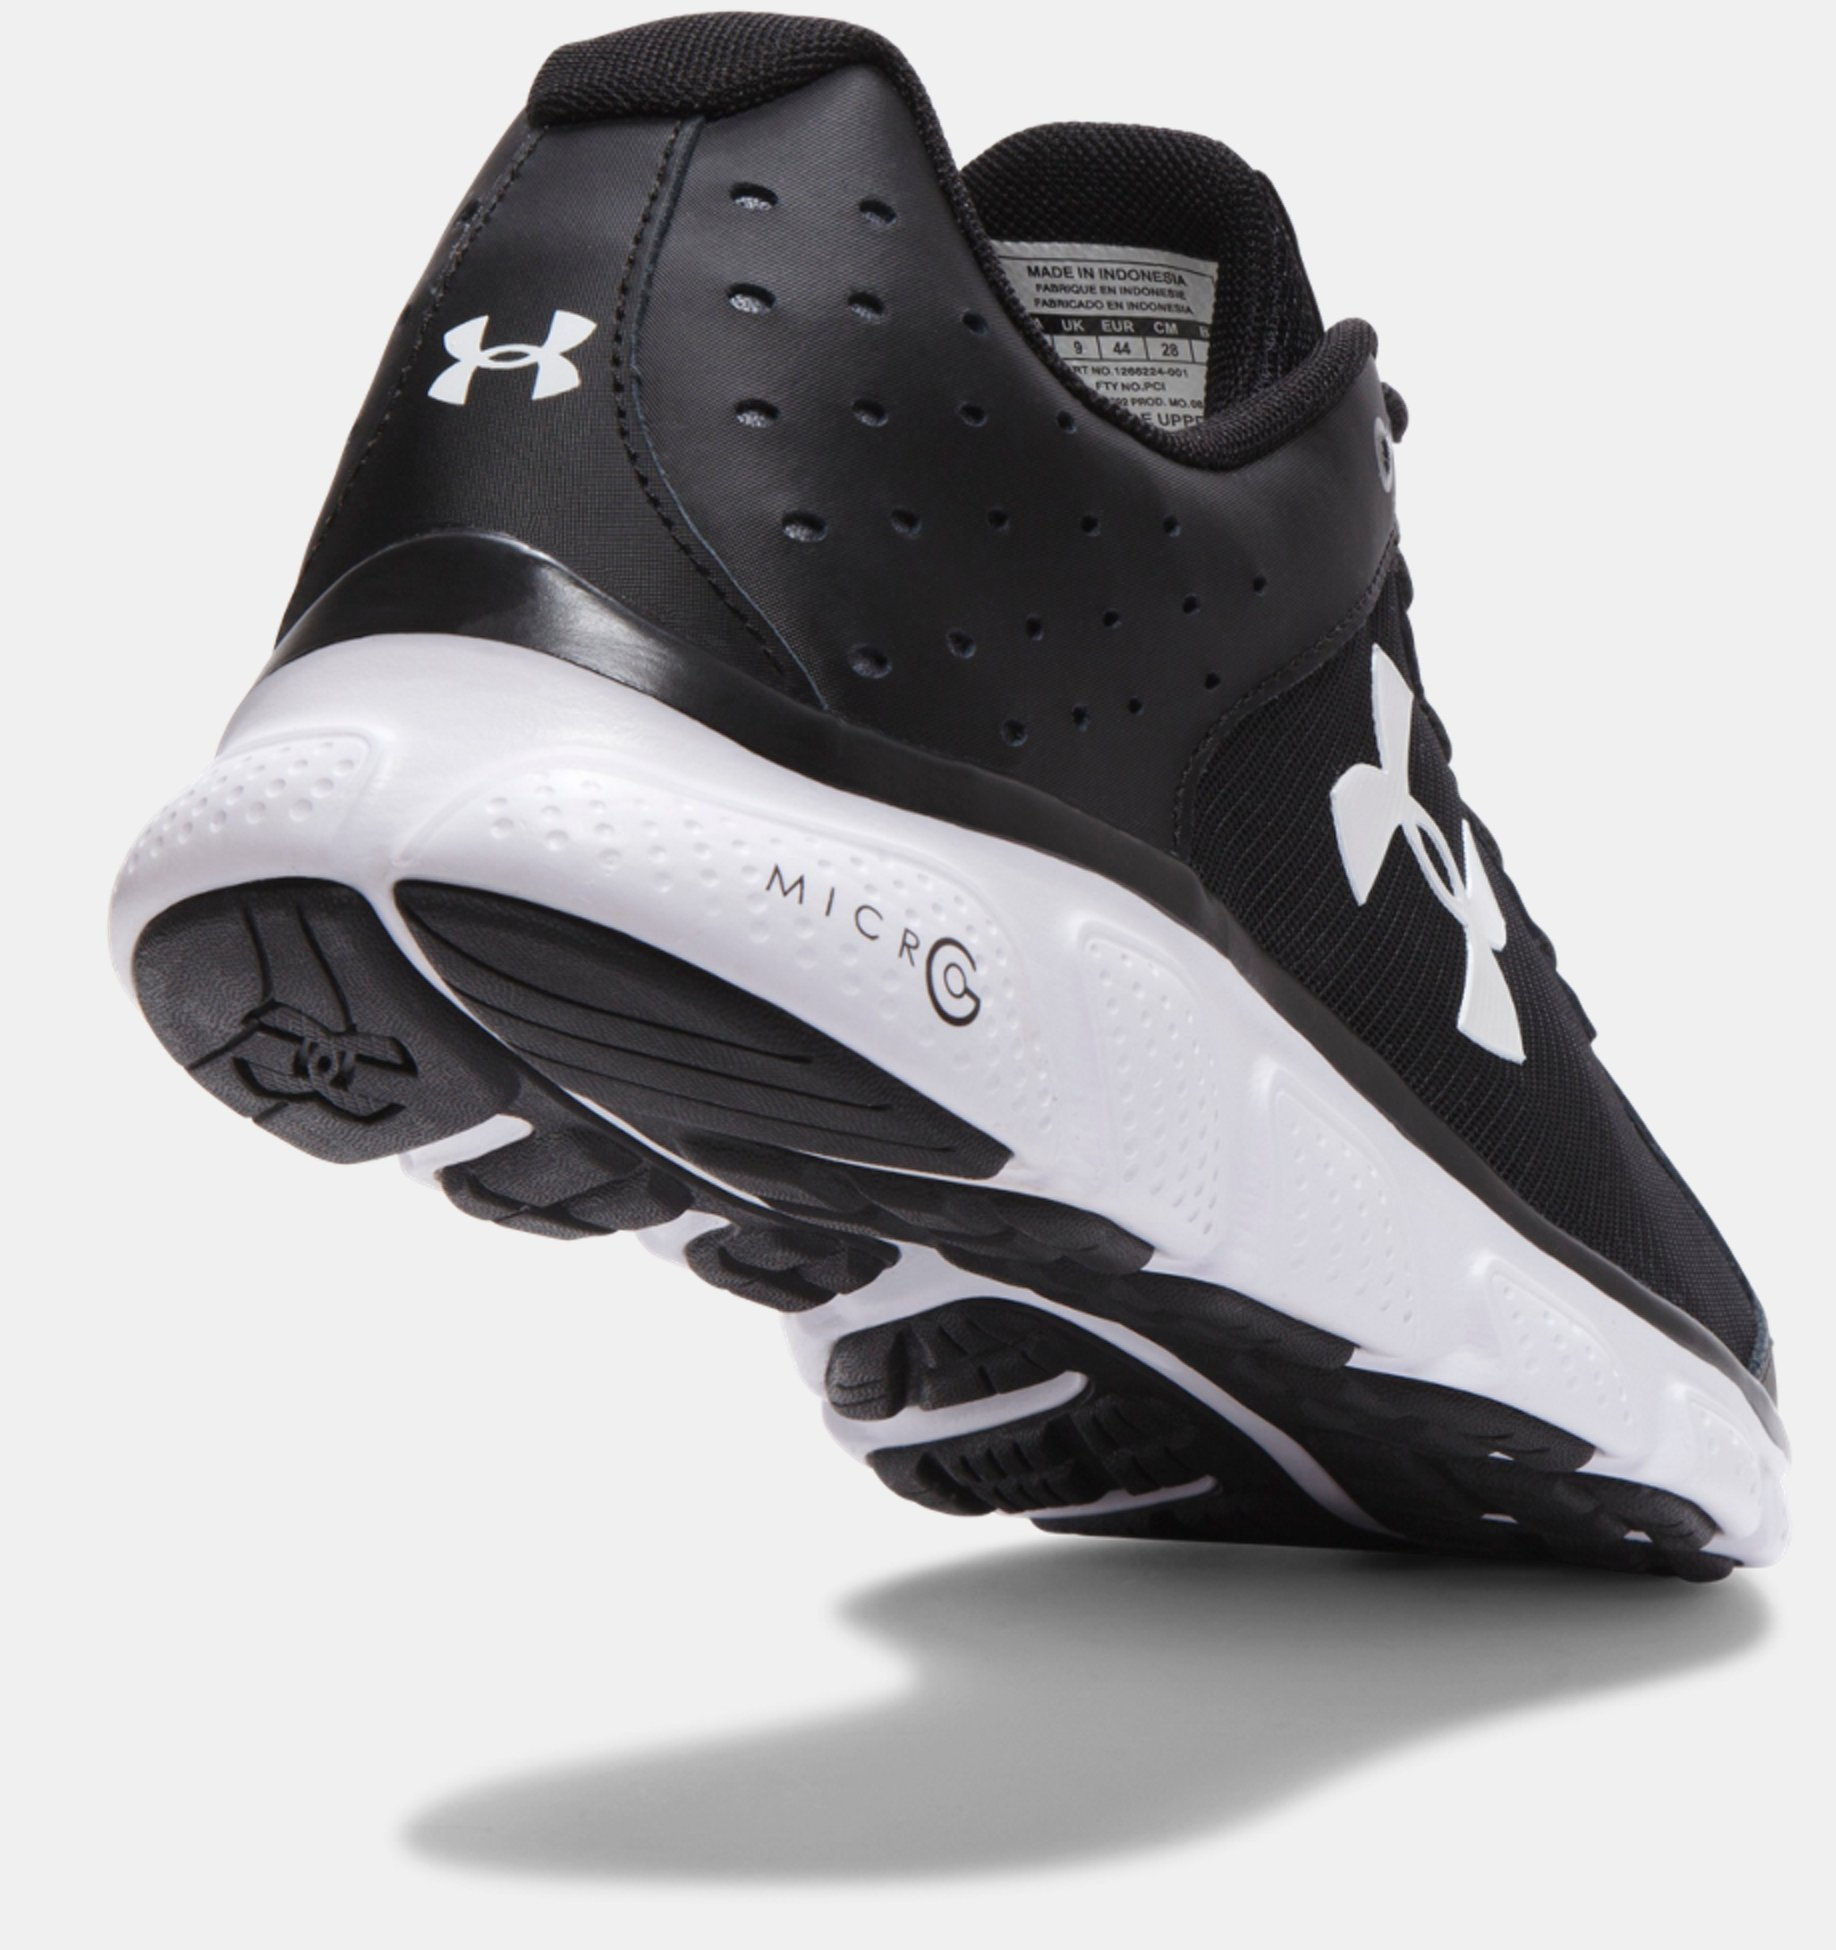 Newton Running Shoes For Metatarsalgia